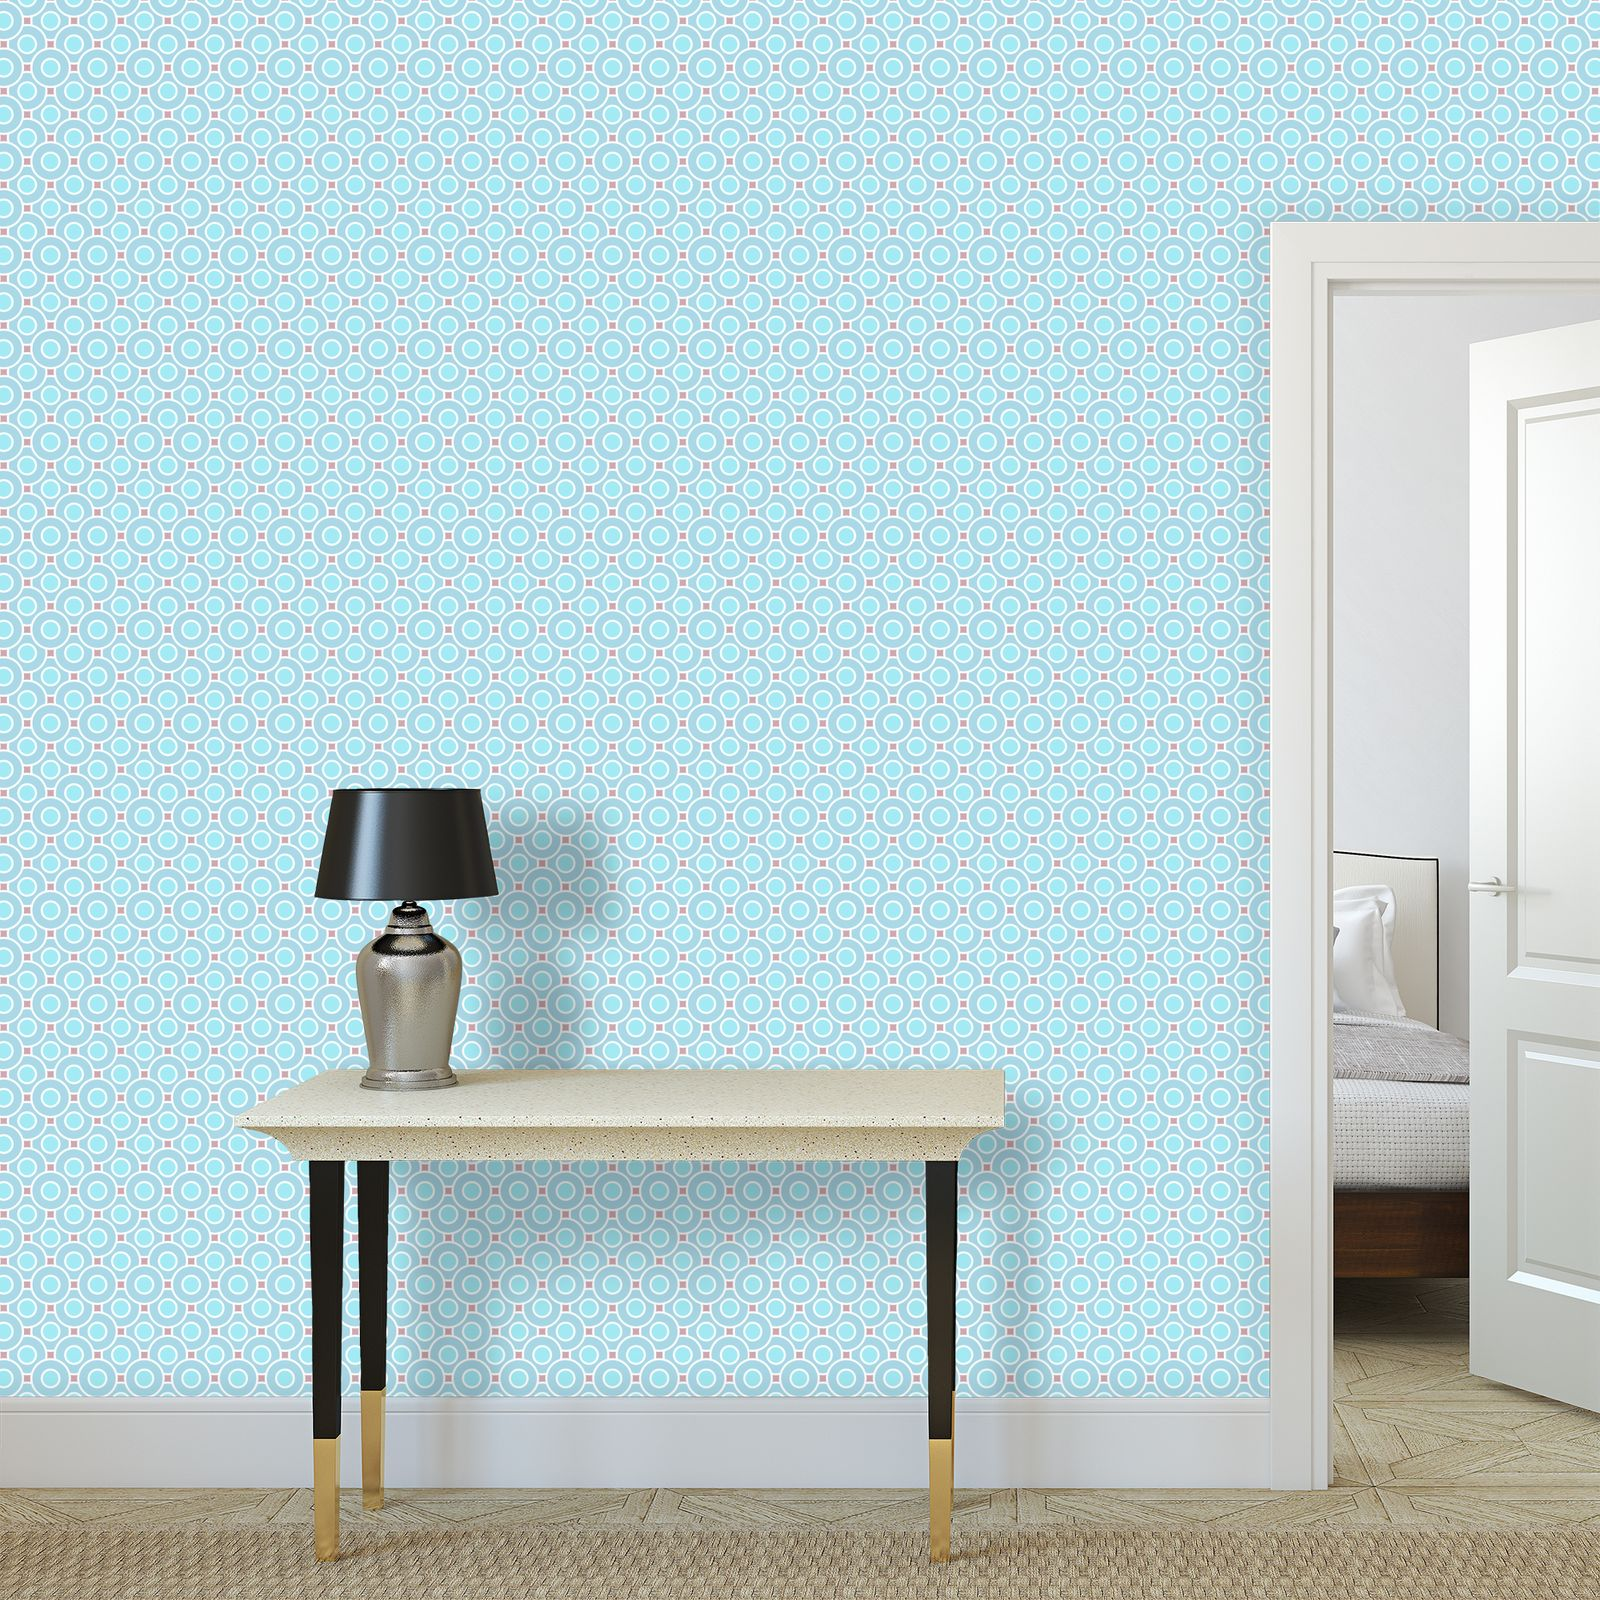 Blue tenderness - Wallpaper Rolls - elegant gift, soft, refined, female, geometric, romantic, airy, fresh, sweet, aerial, guipure - design by Tiana Lofd